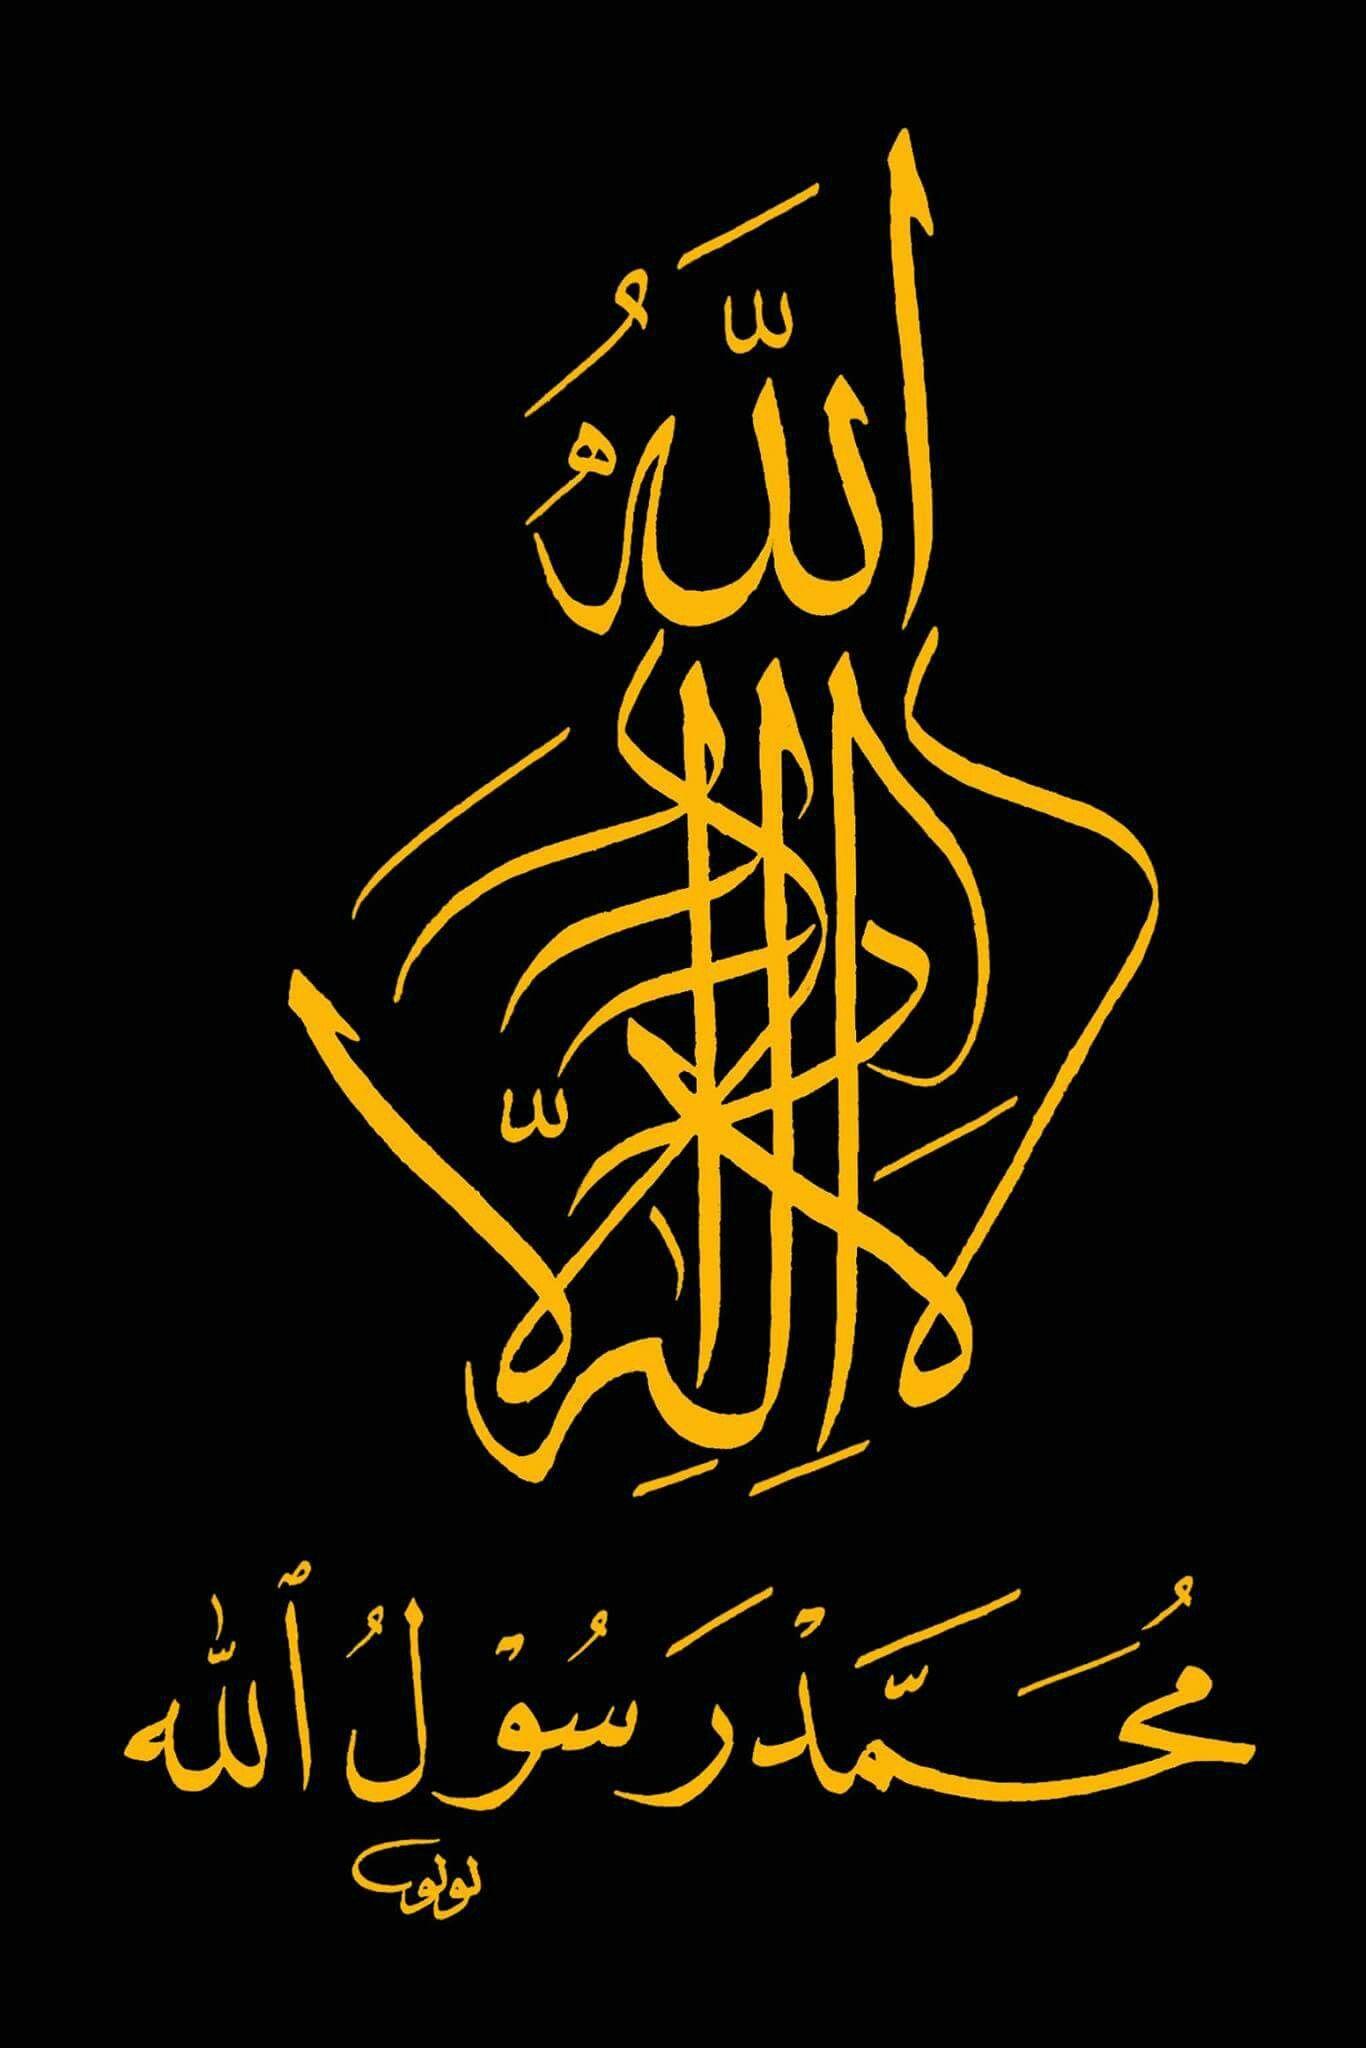 Pin Oleh Khaireddine Yacoubi Di كلمة الشهادتين وتوحيد Seni Huruf Kaligrafi Arab